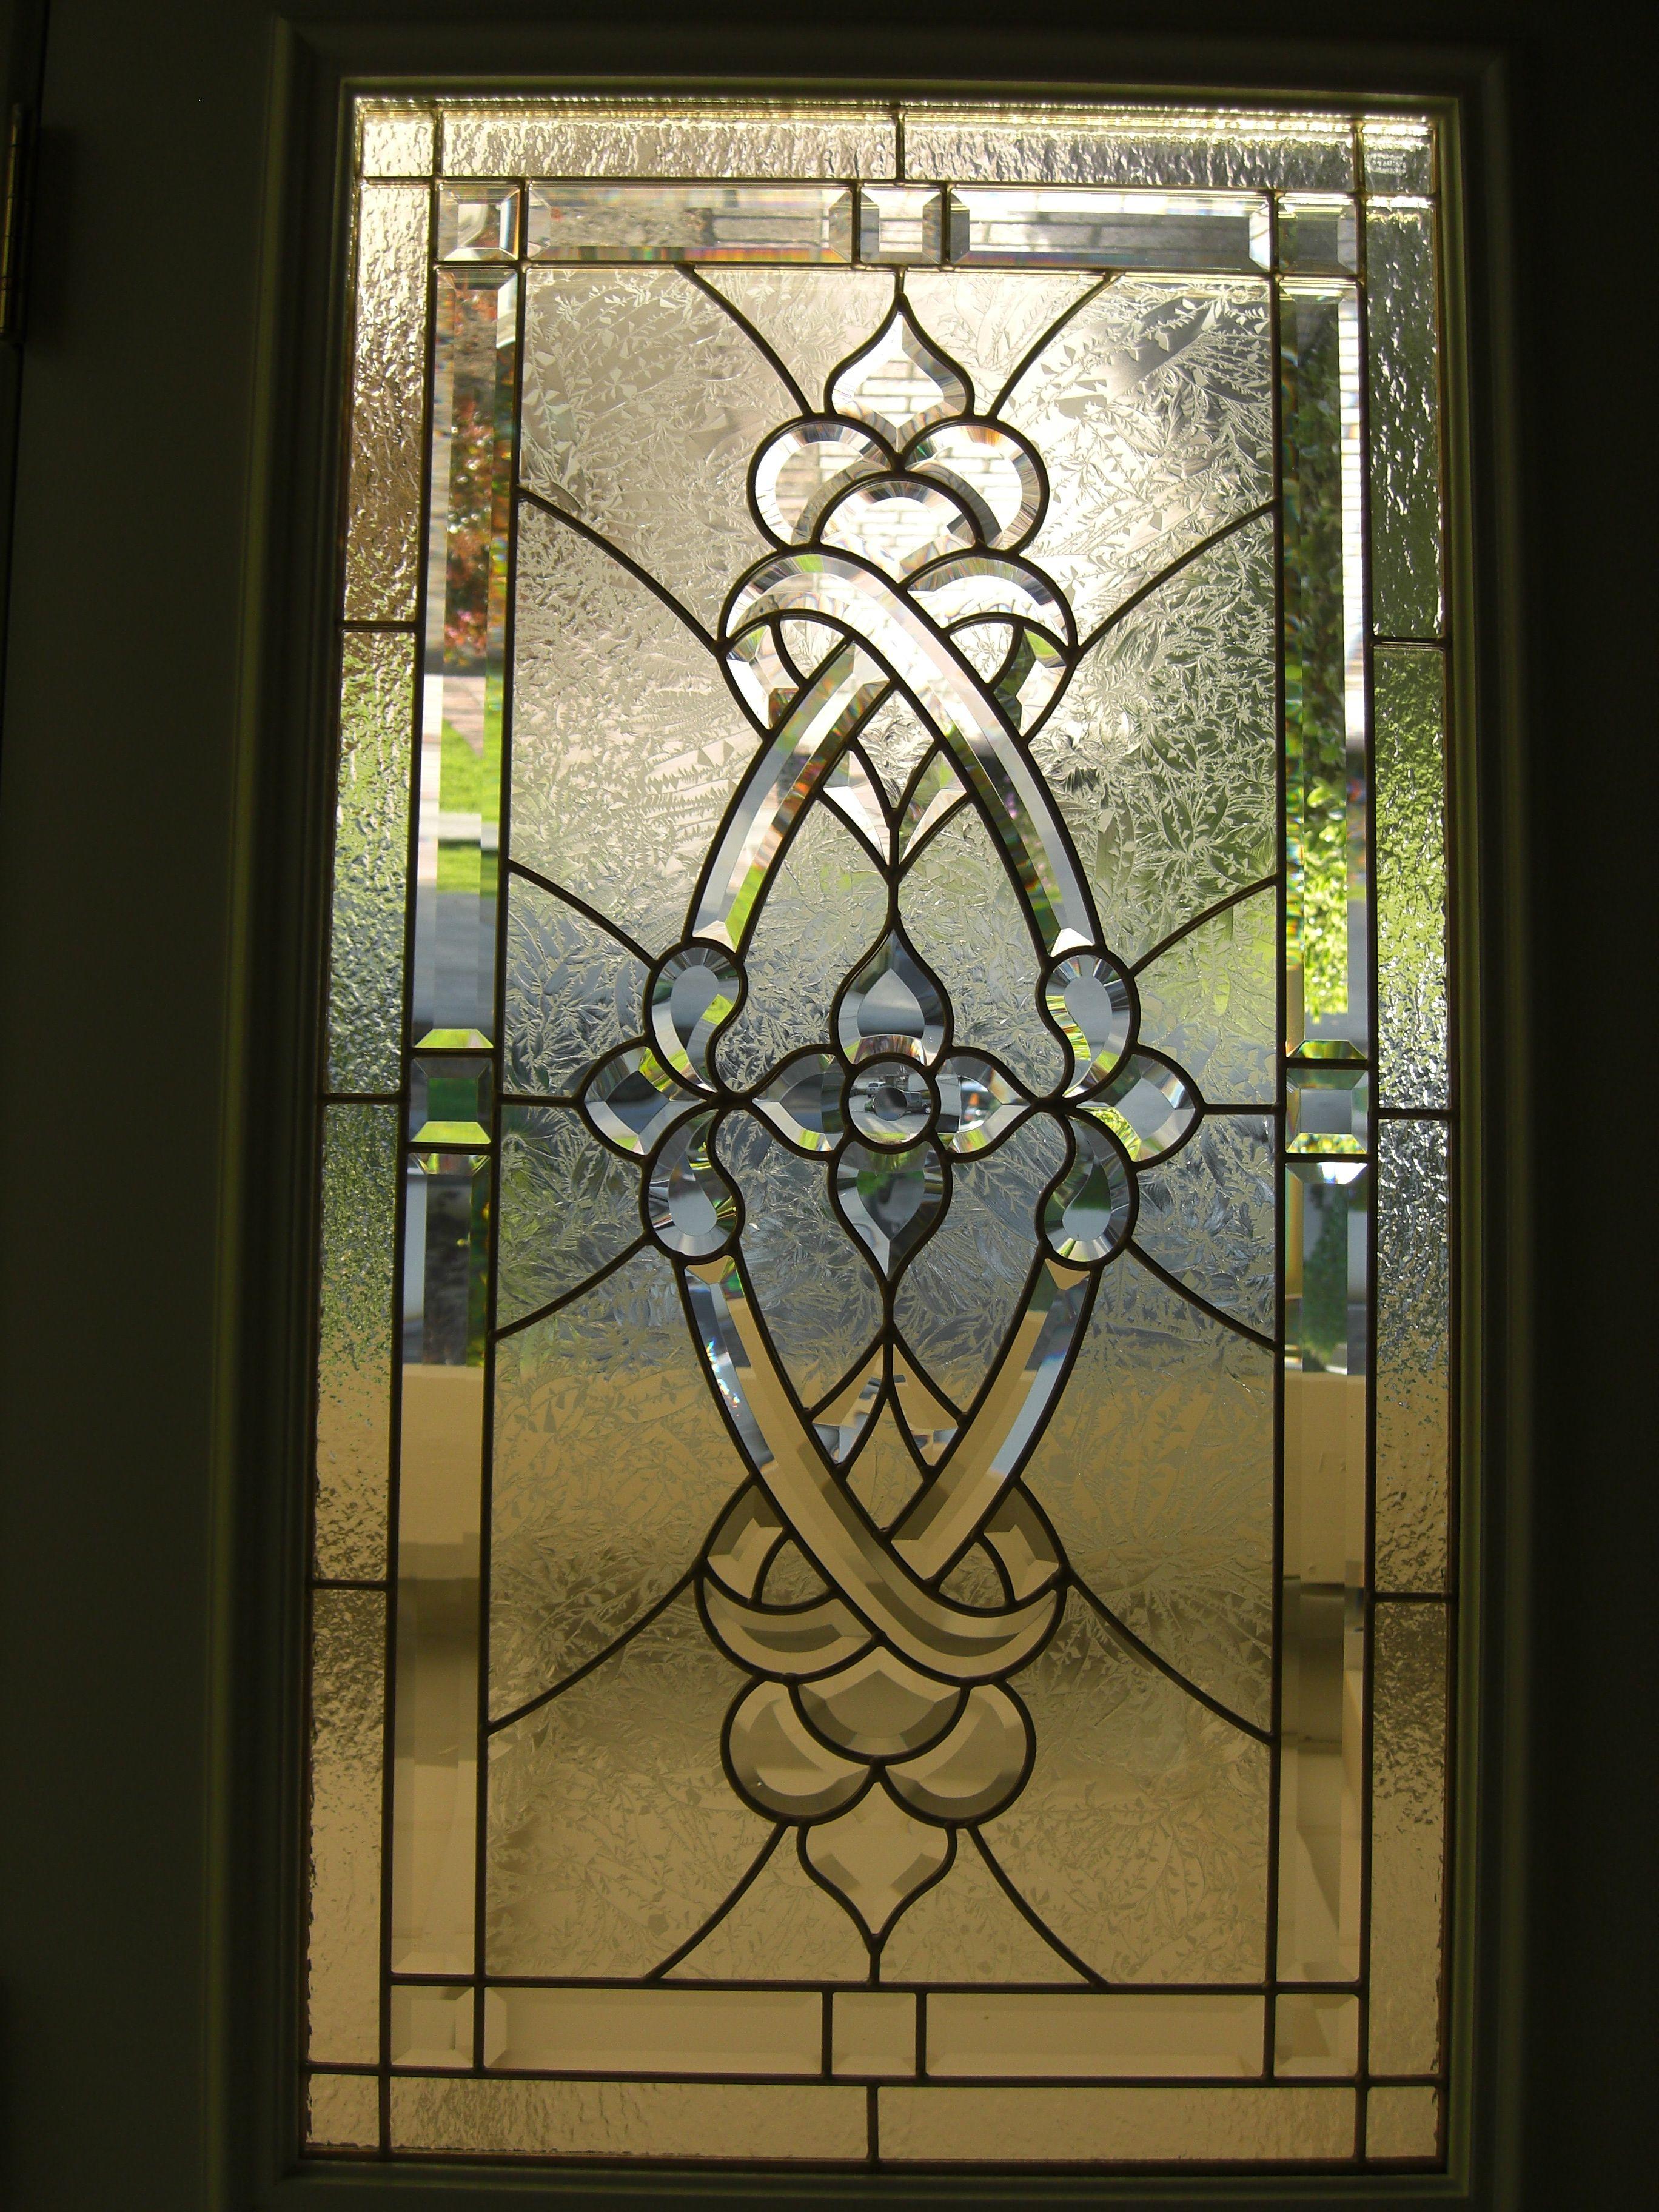 Legacyglass Com Wp Content Uploads 2014 03 Picture 439 Jpg Stained Glass Diy Stained Glass Designs Glass Window Art